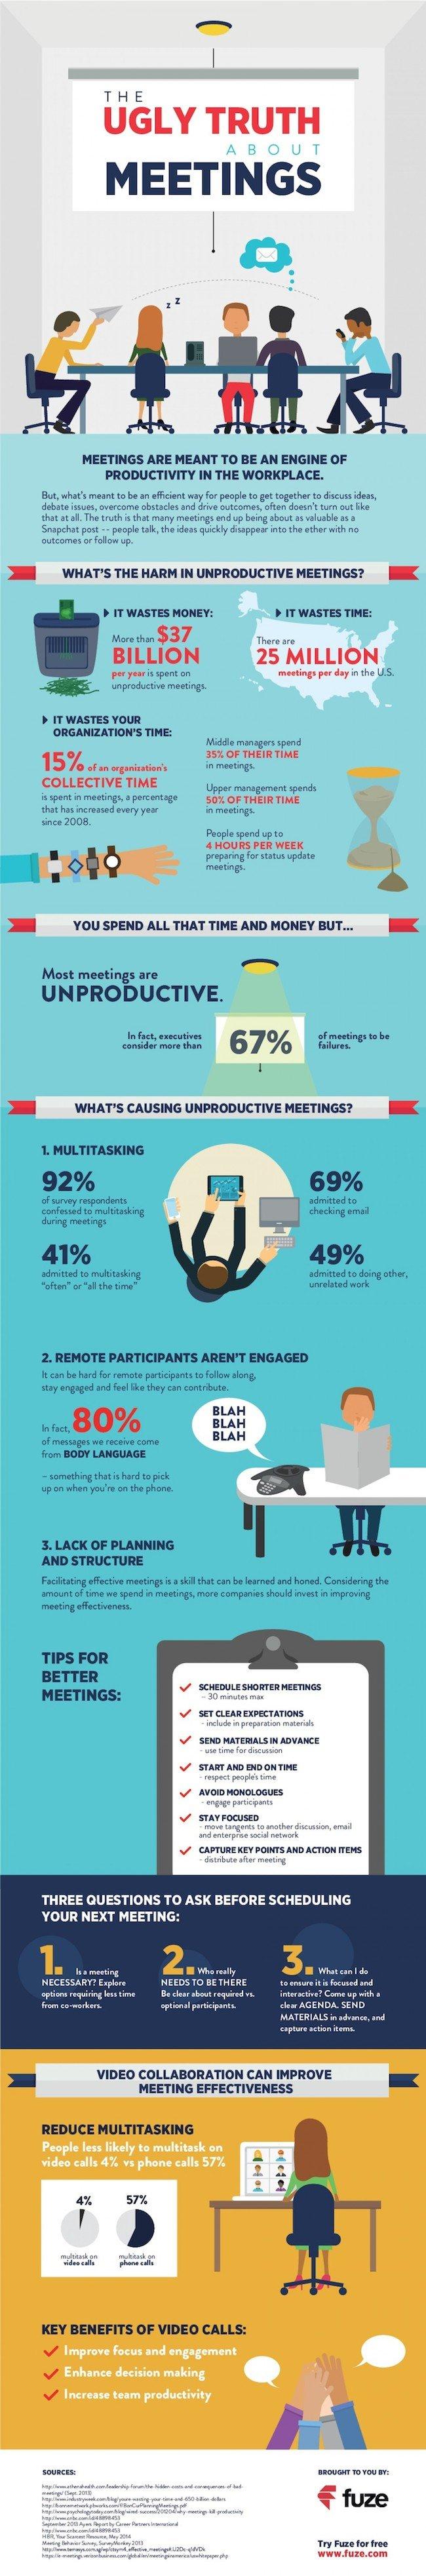 ugly-truth-meetings-ig